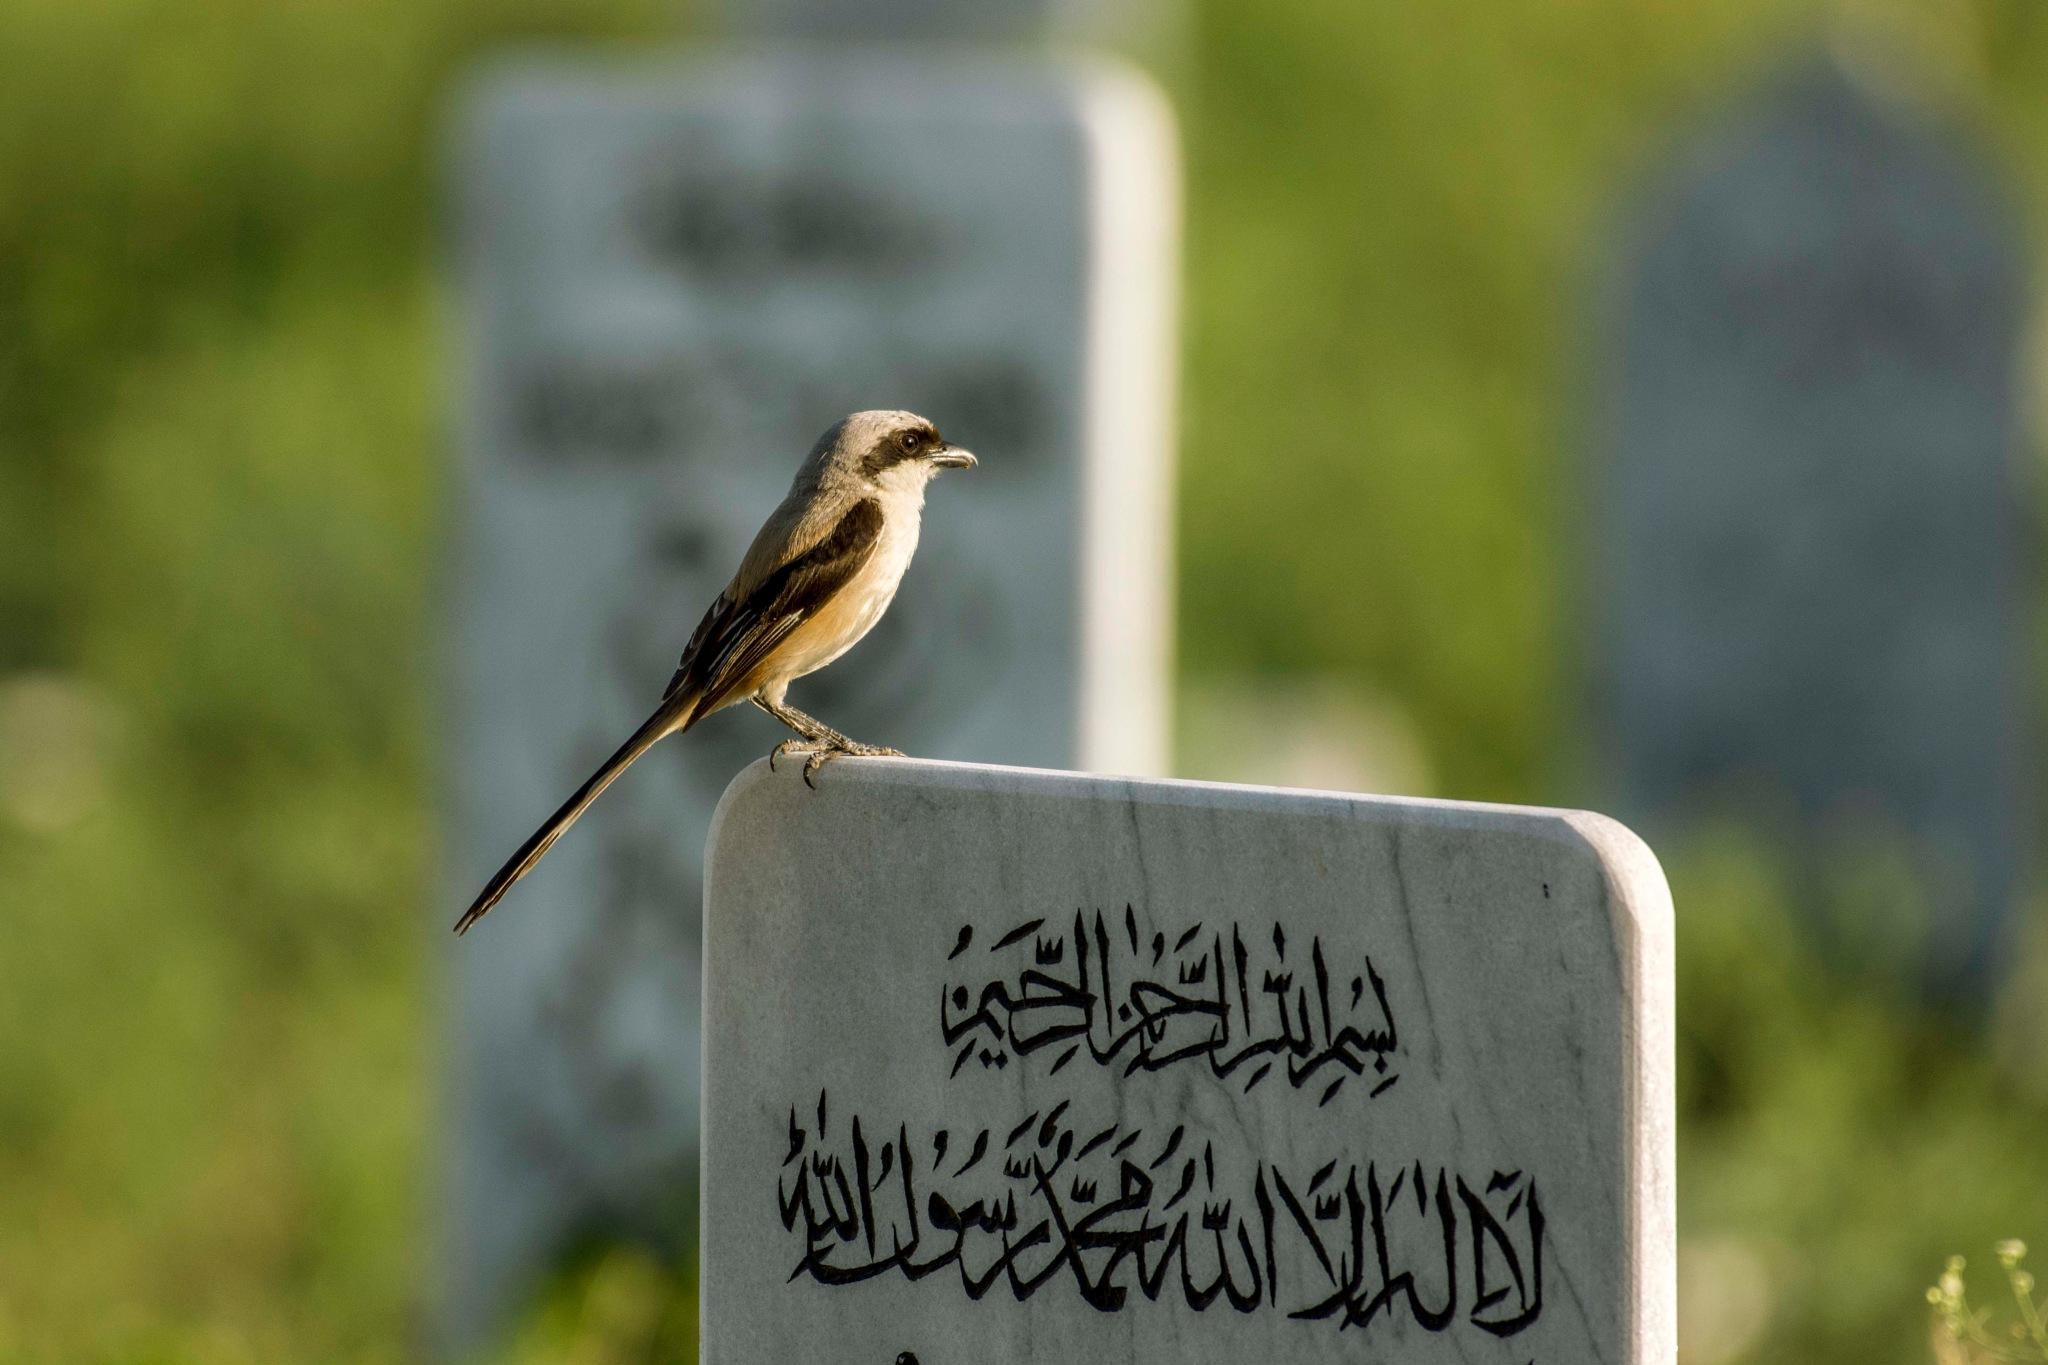 Bird in grave yard by Muhammad Azhar Hafeez